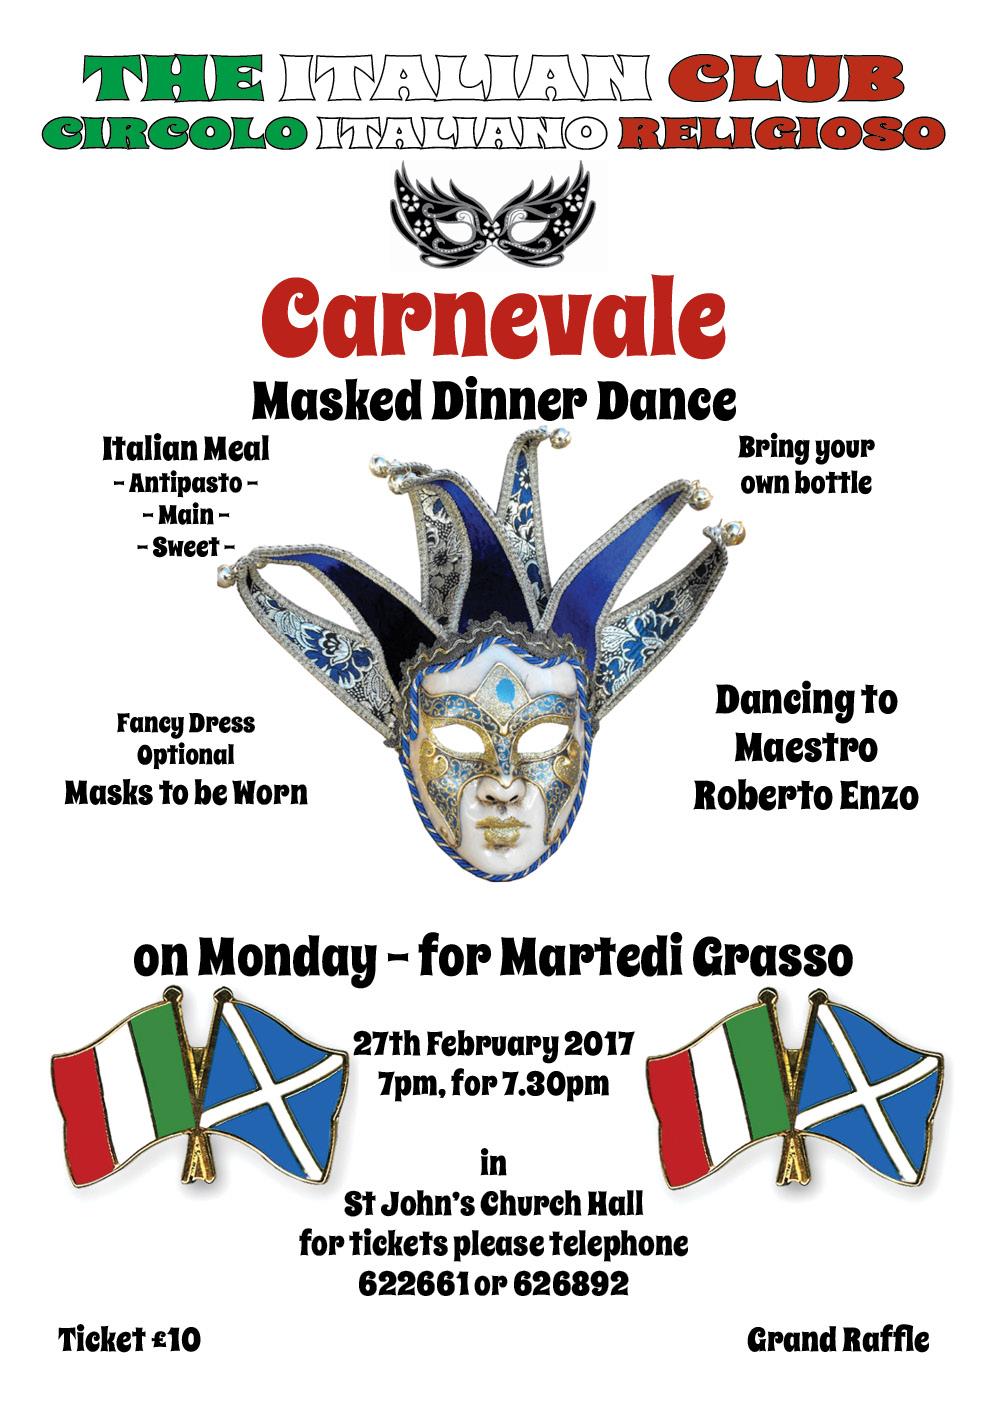 Carnevale - Masked Dinner Dance @ St John's RC Church Hall | Scotland | United Kingdom